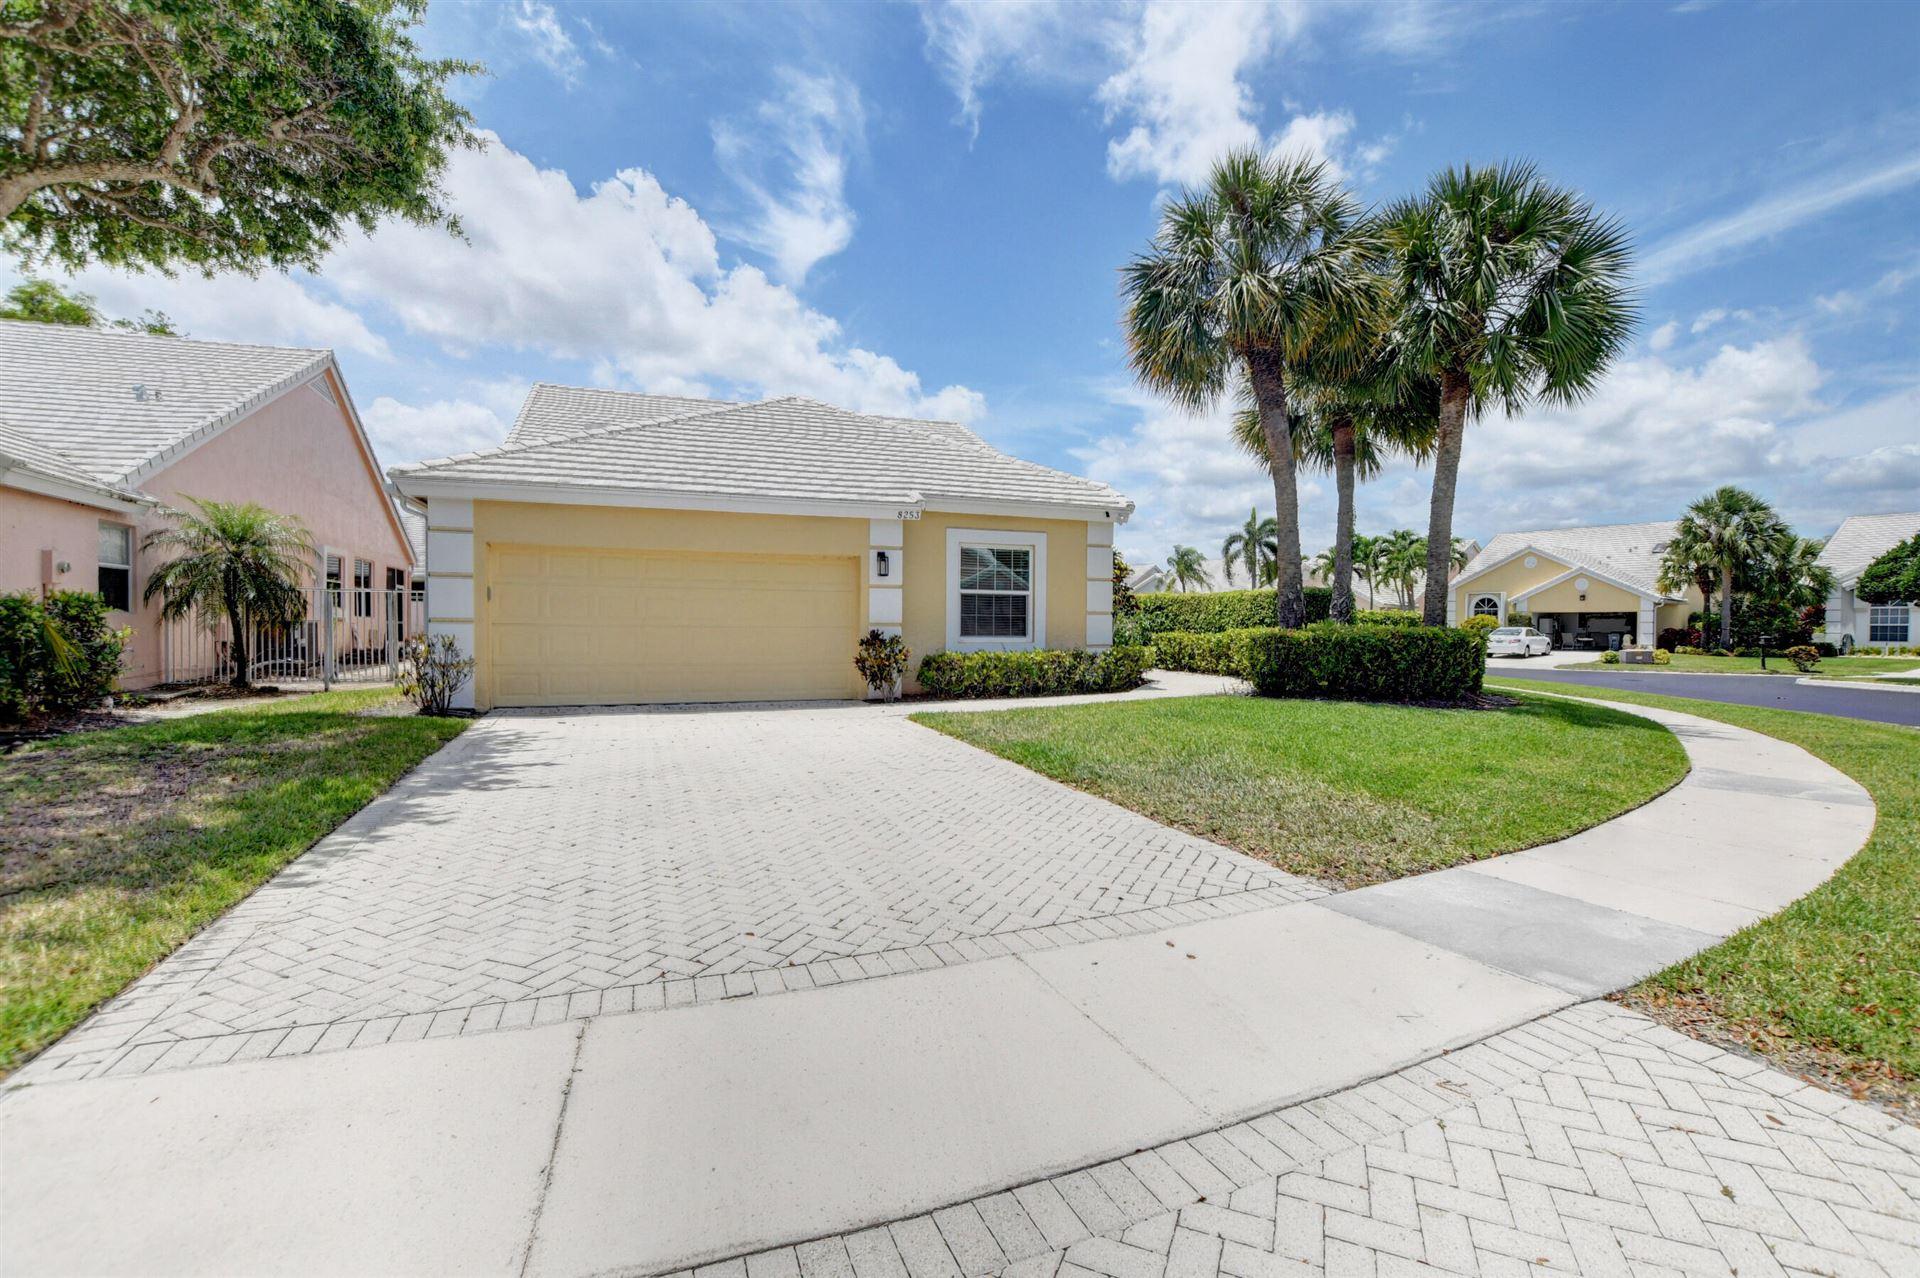 8253 Horseshoe Bay Road, Boynton Beach, FL 33472 - MLS#: RX-10713251